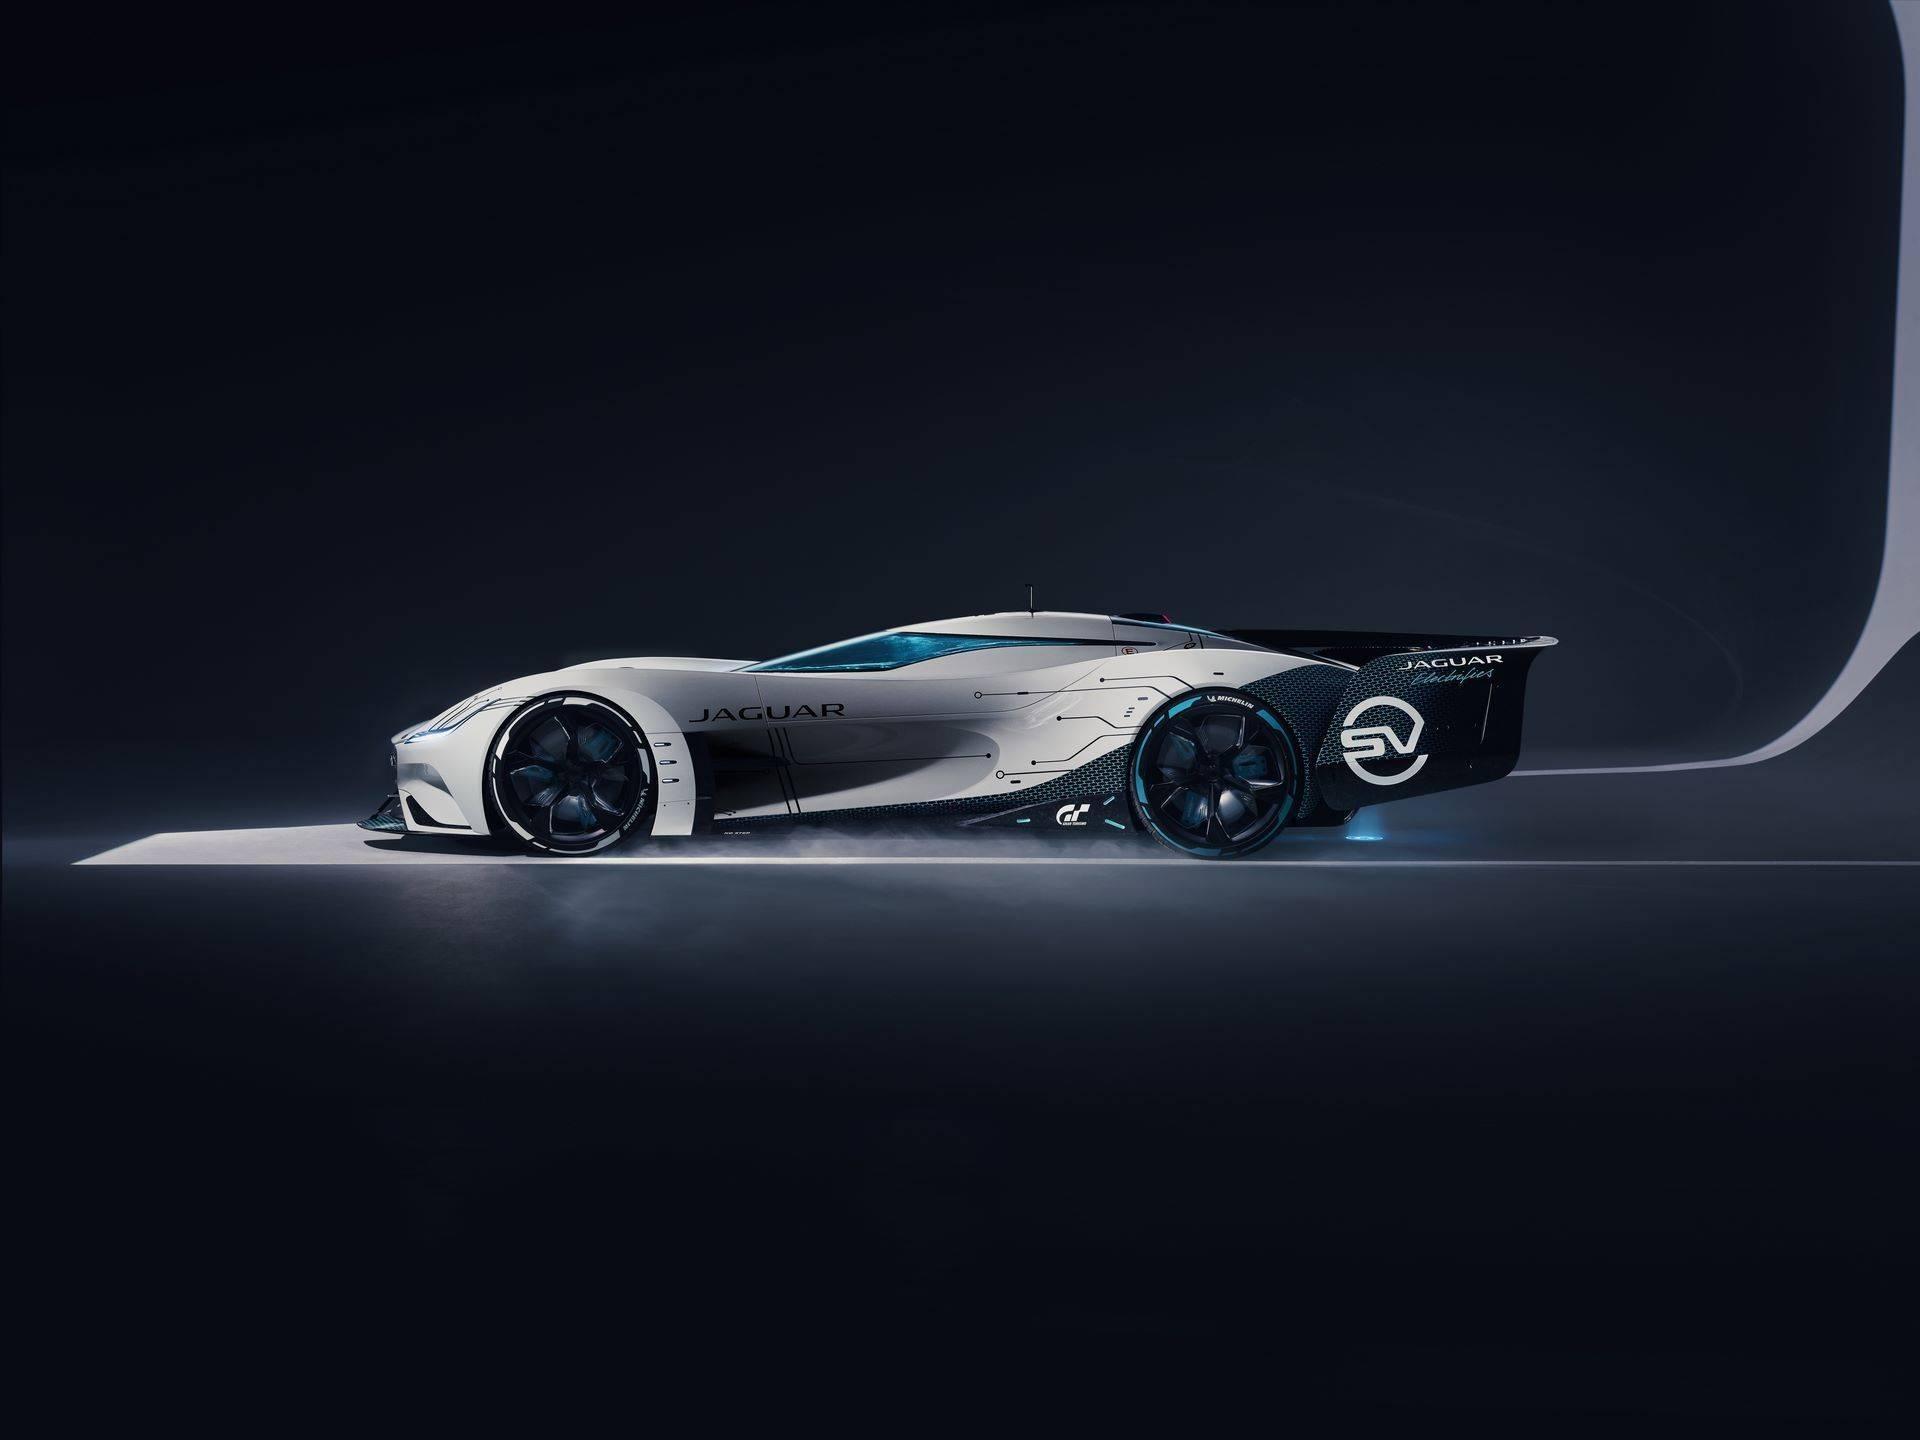 Jaguar-Vision-Gran-Turismo-SV-42